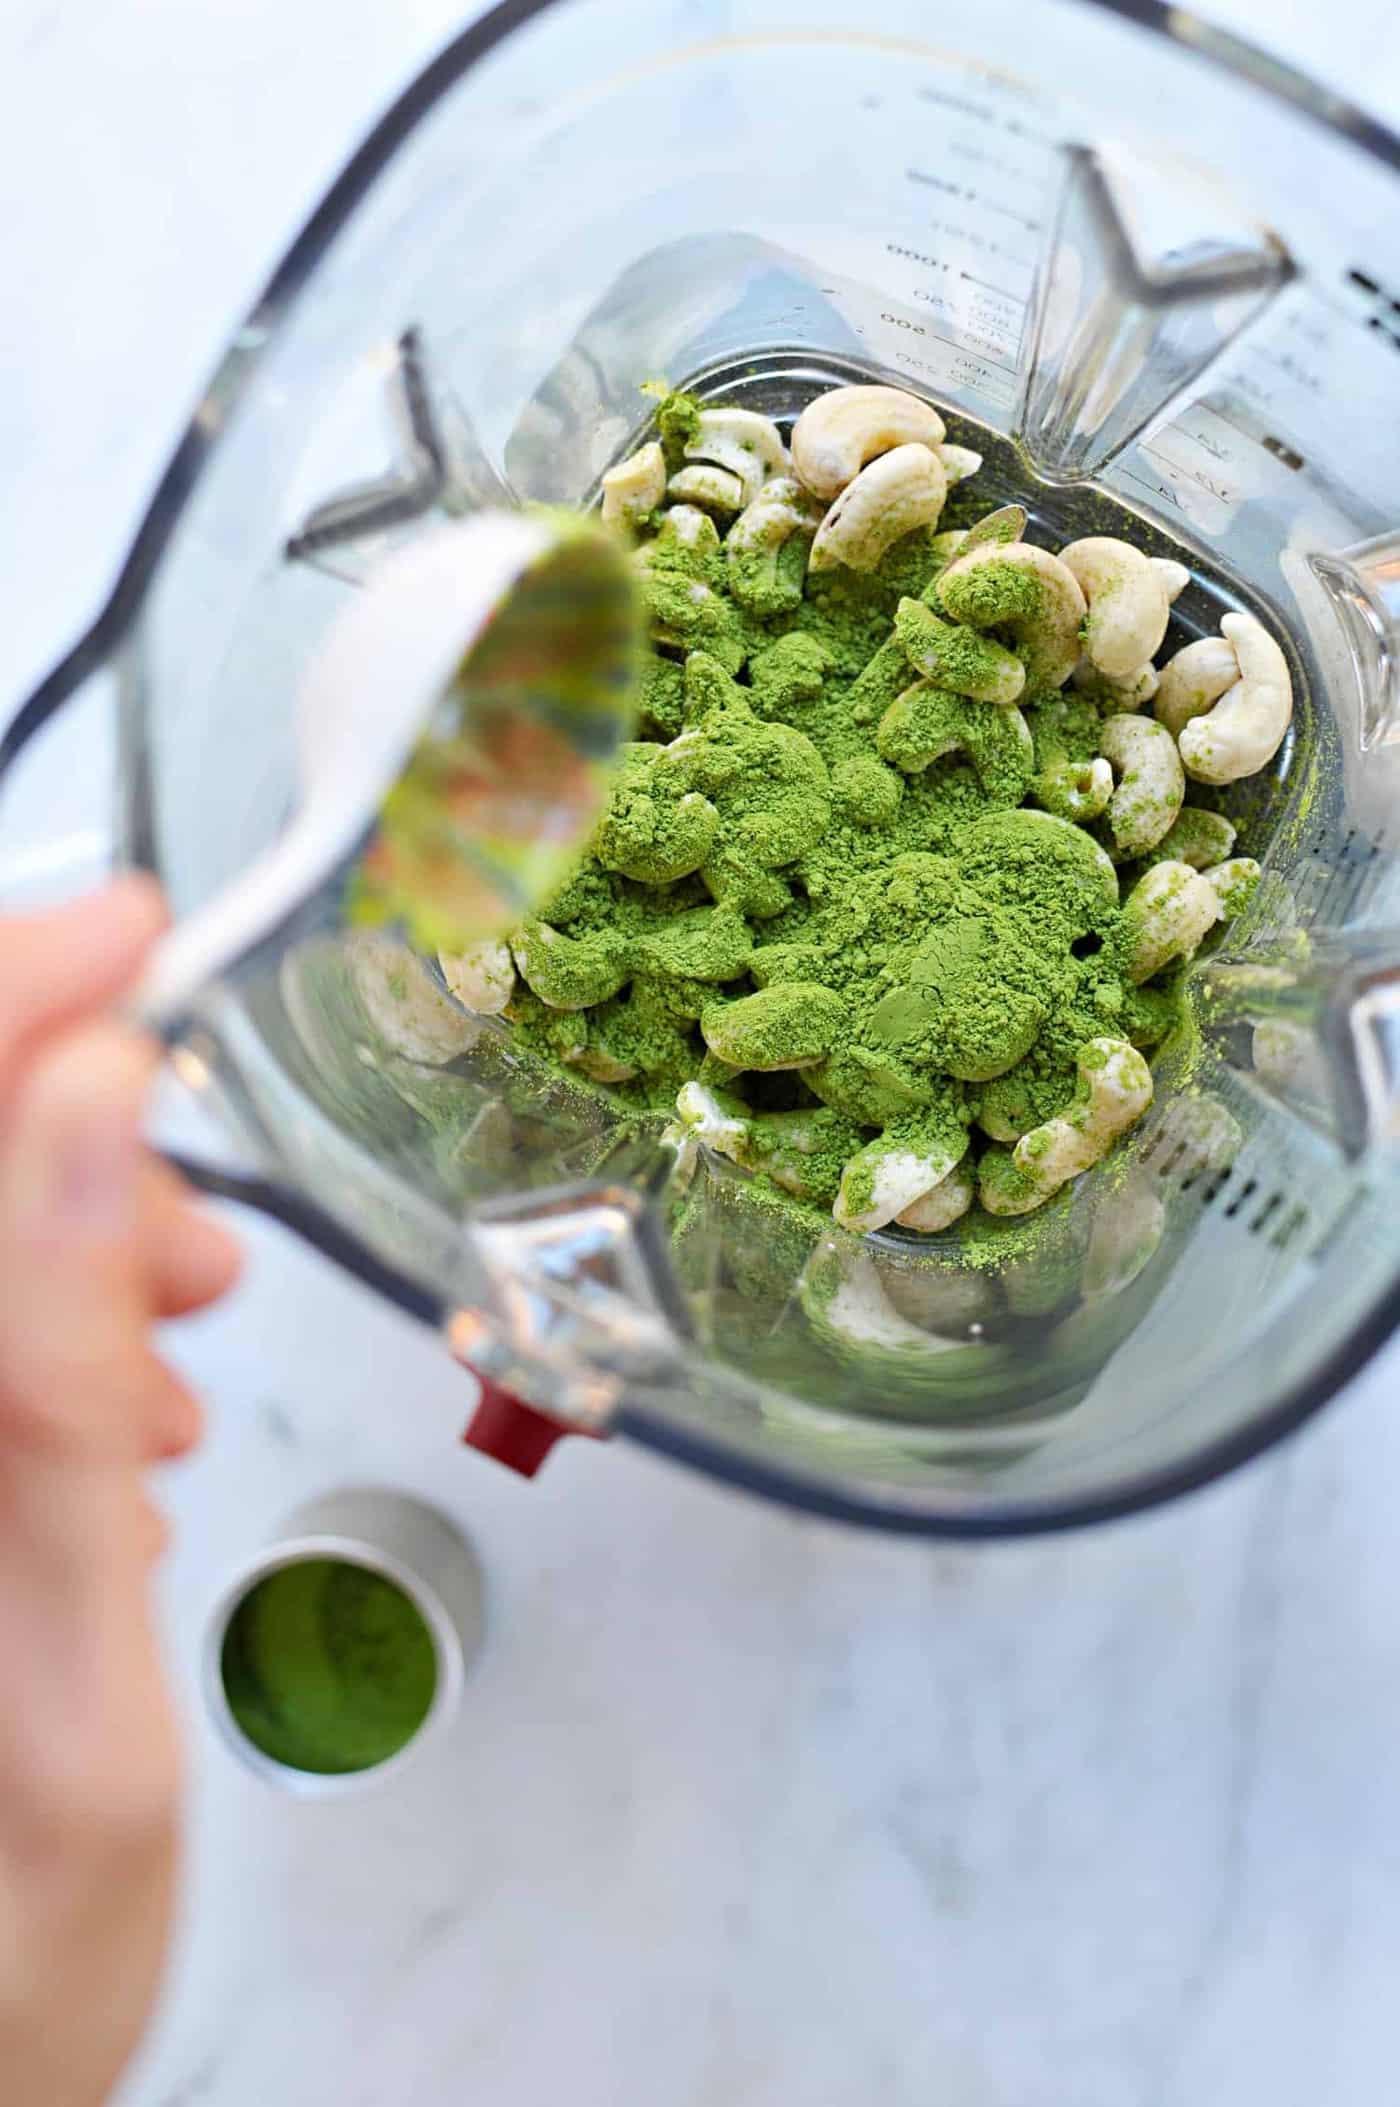 Creamy Cashew-Maple Matcha Lattes (Vegan) via thepigandquill.com #dairyfree #greentea